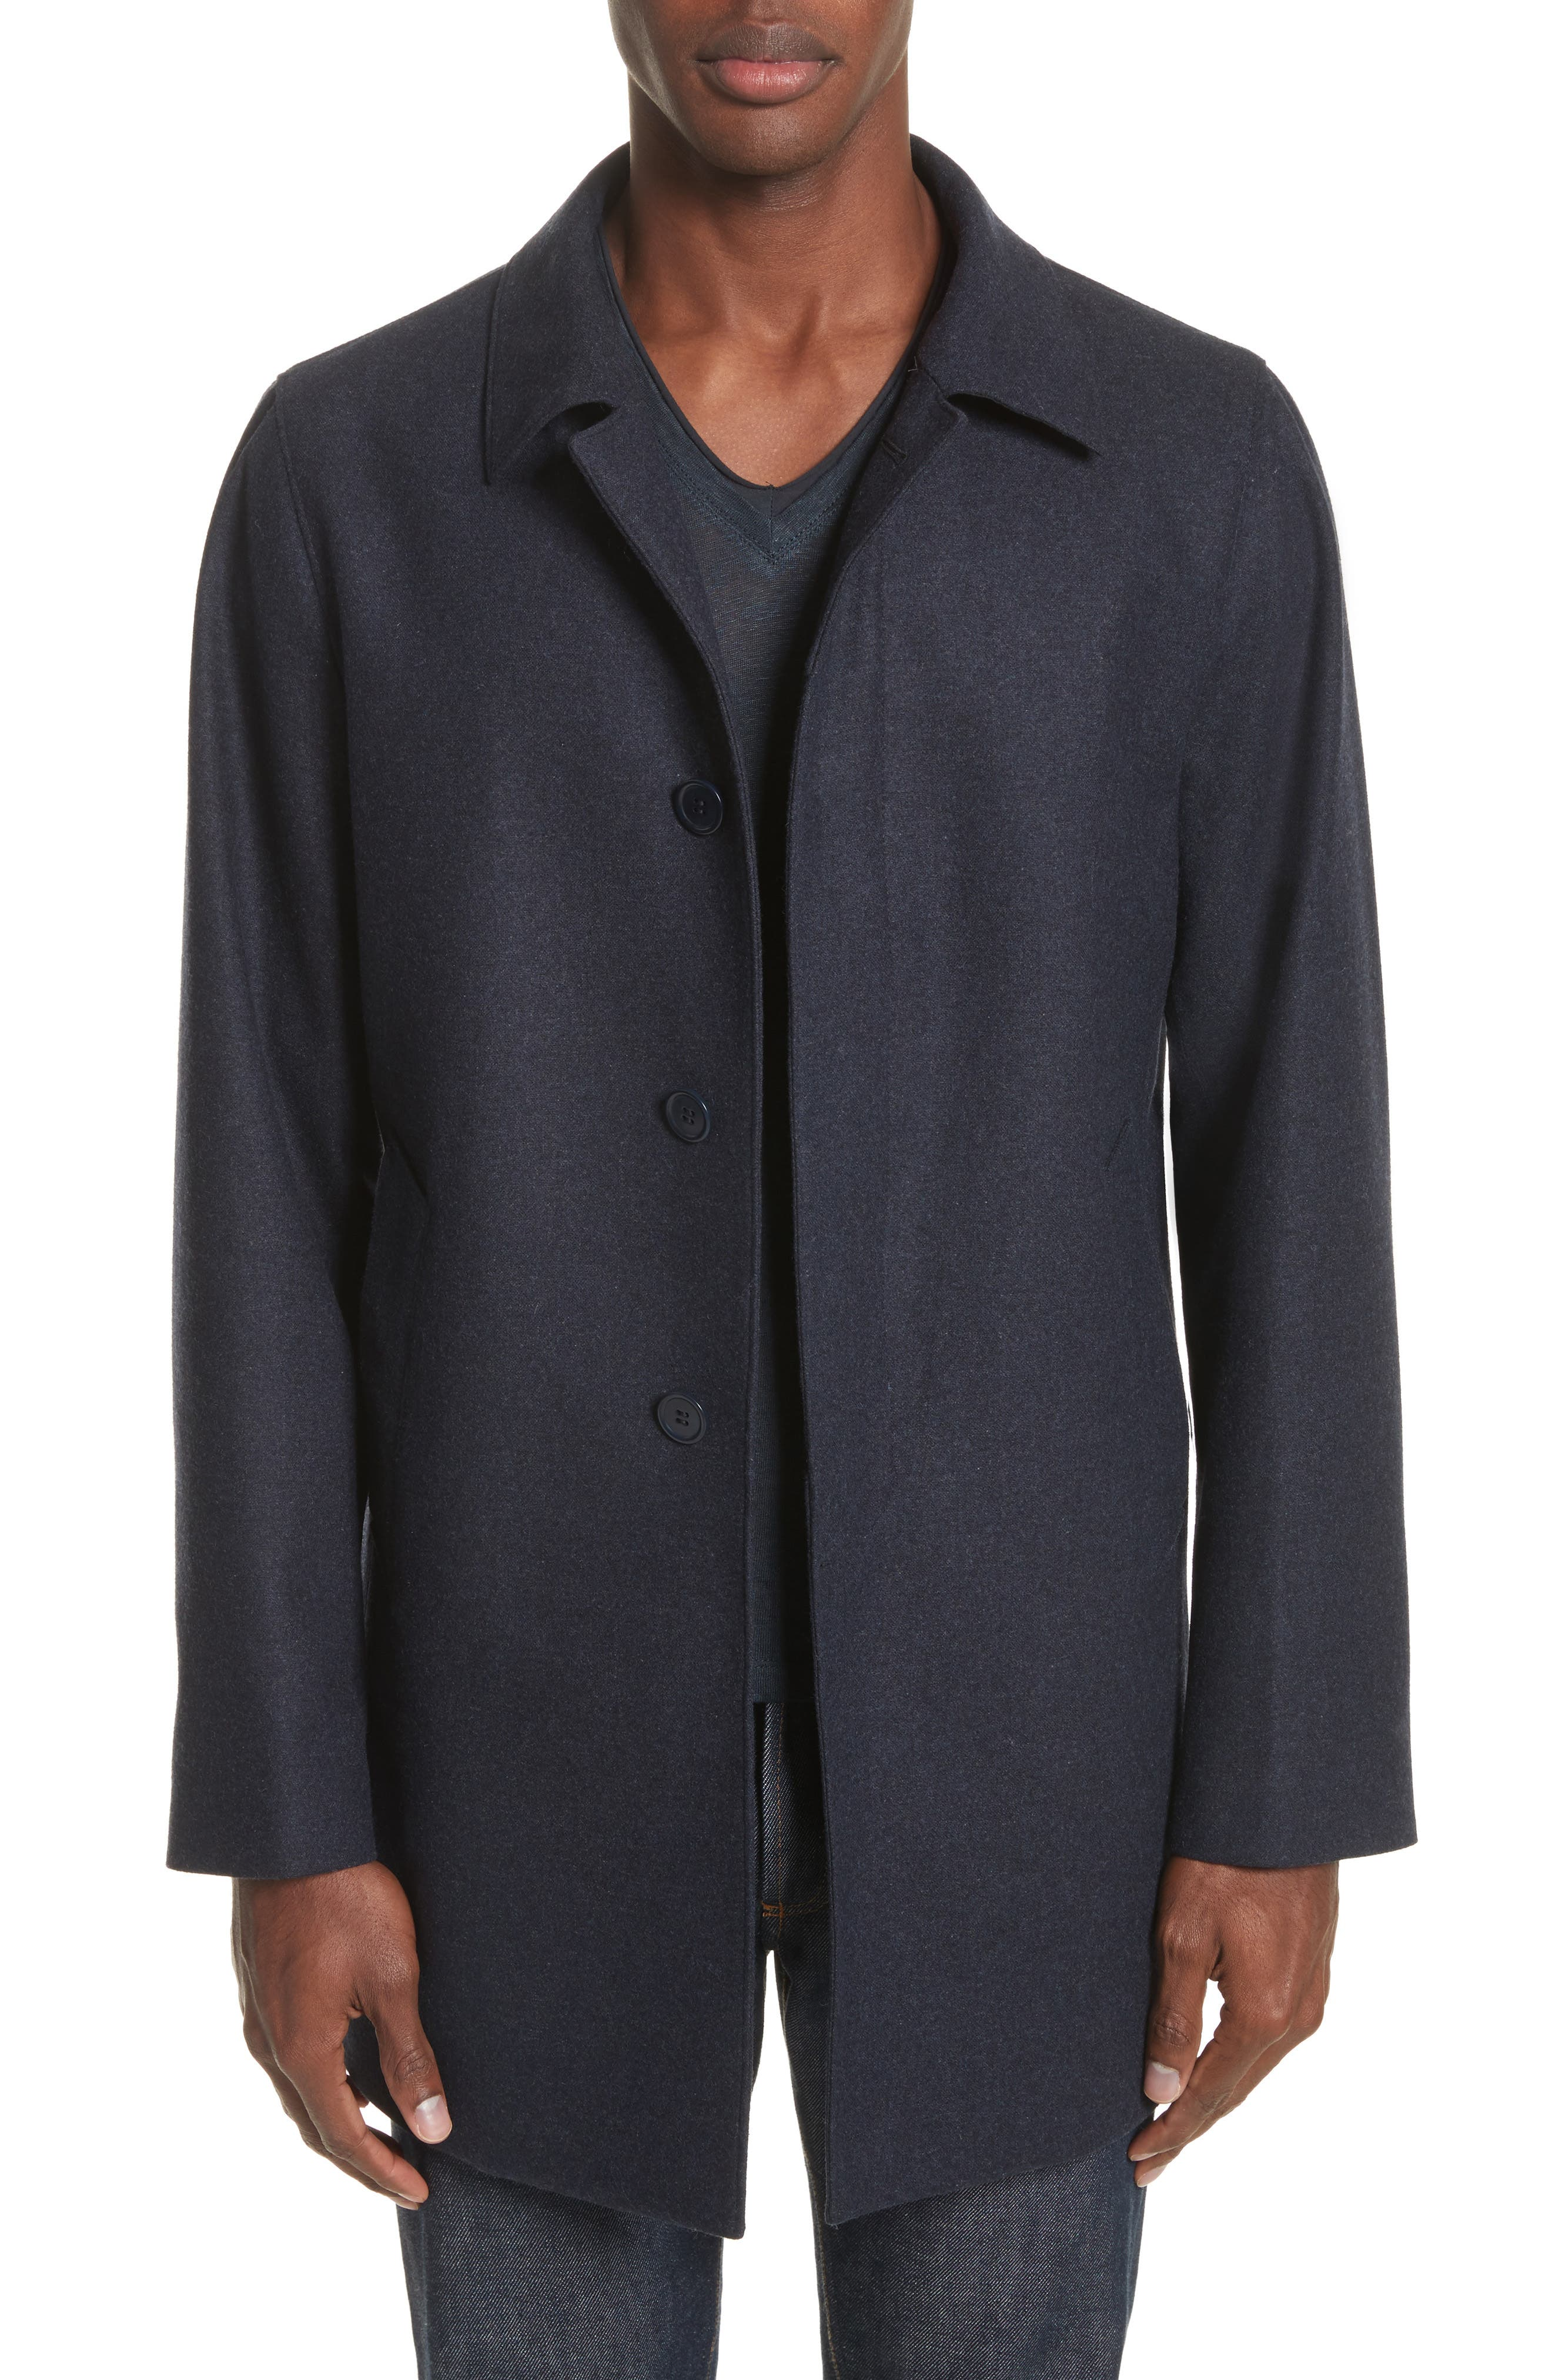 Buckley Wool Blend Topcoat,                         Main,                         color, Navy